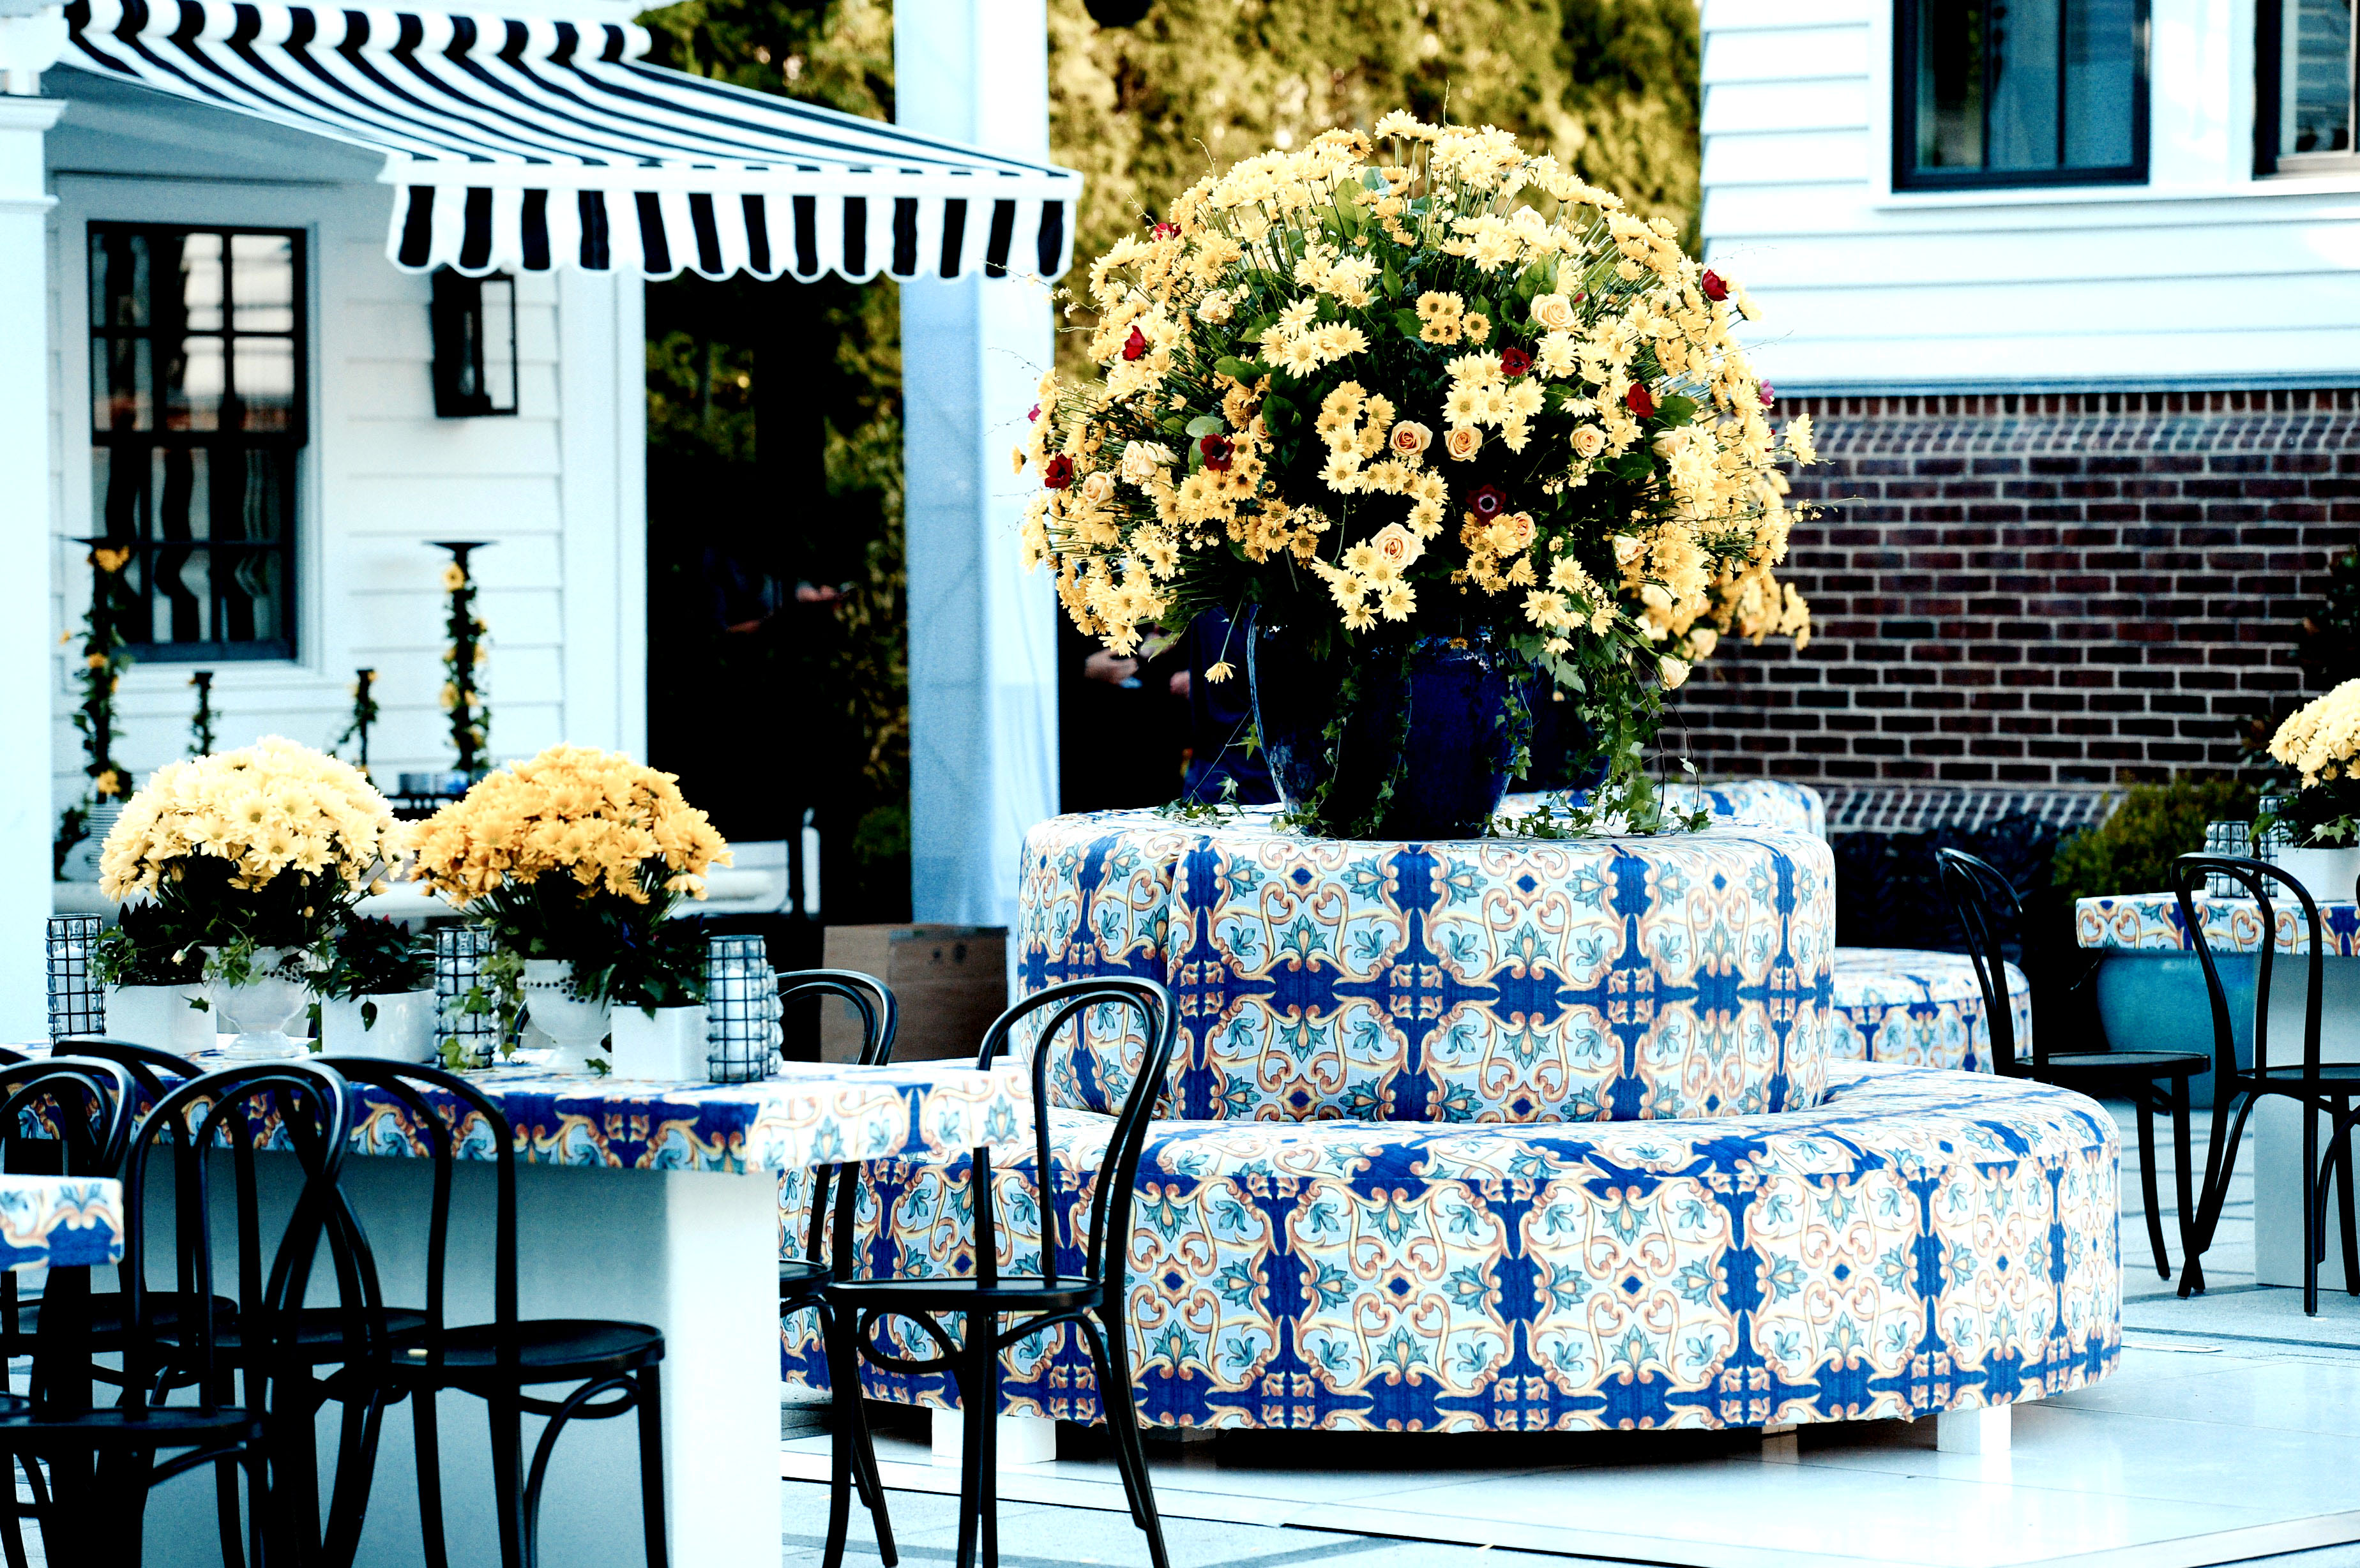 Dolce & Gabbana Inspired Party - Birch Event Design